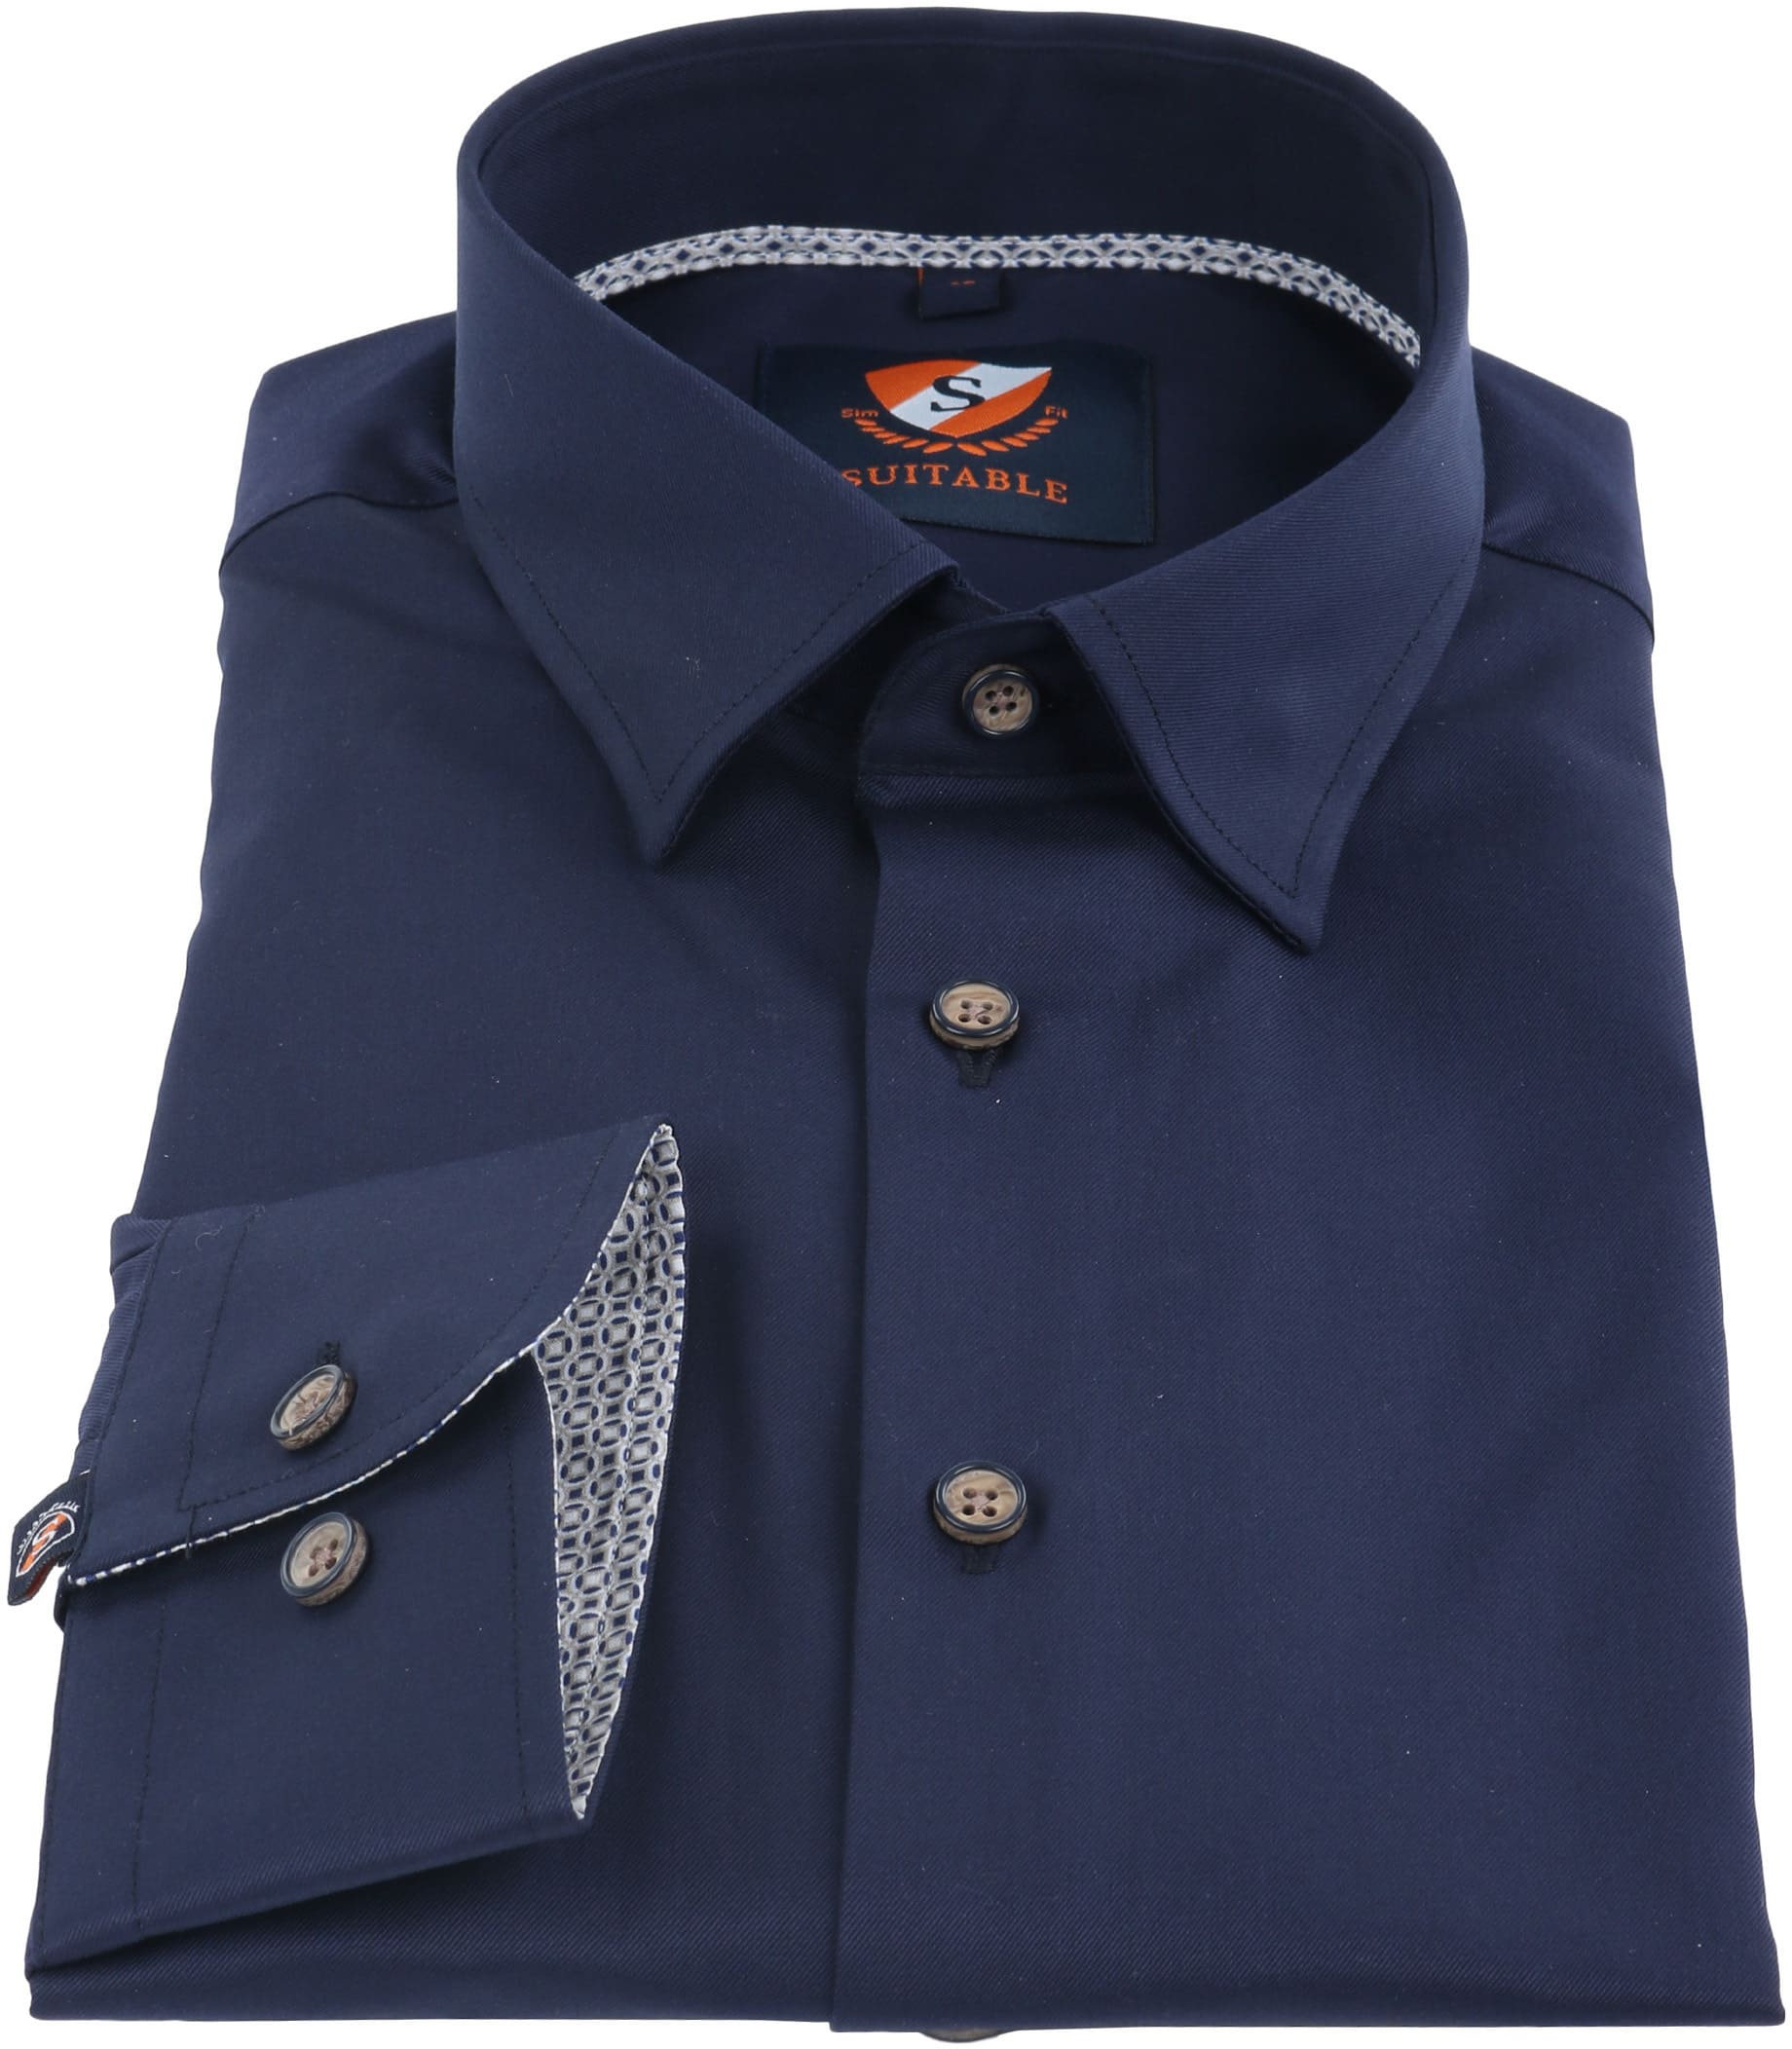 Suitable Overhemd Navy HBD foto 1